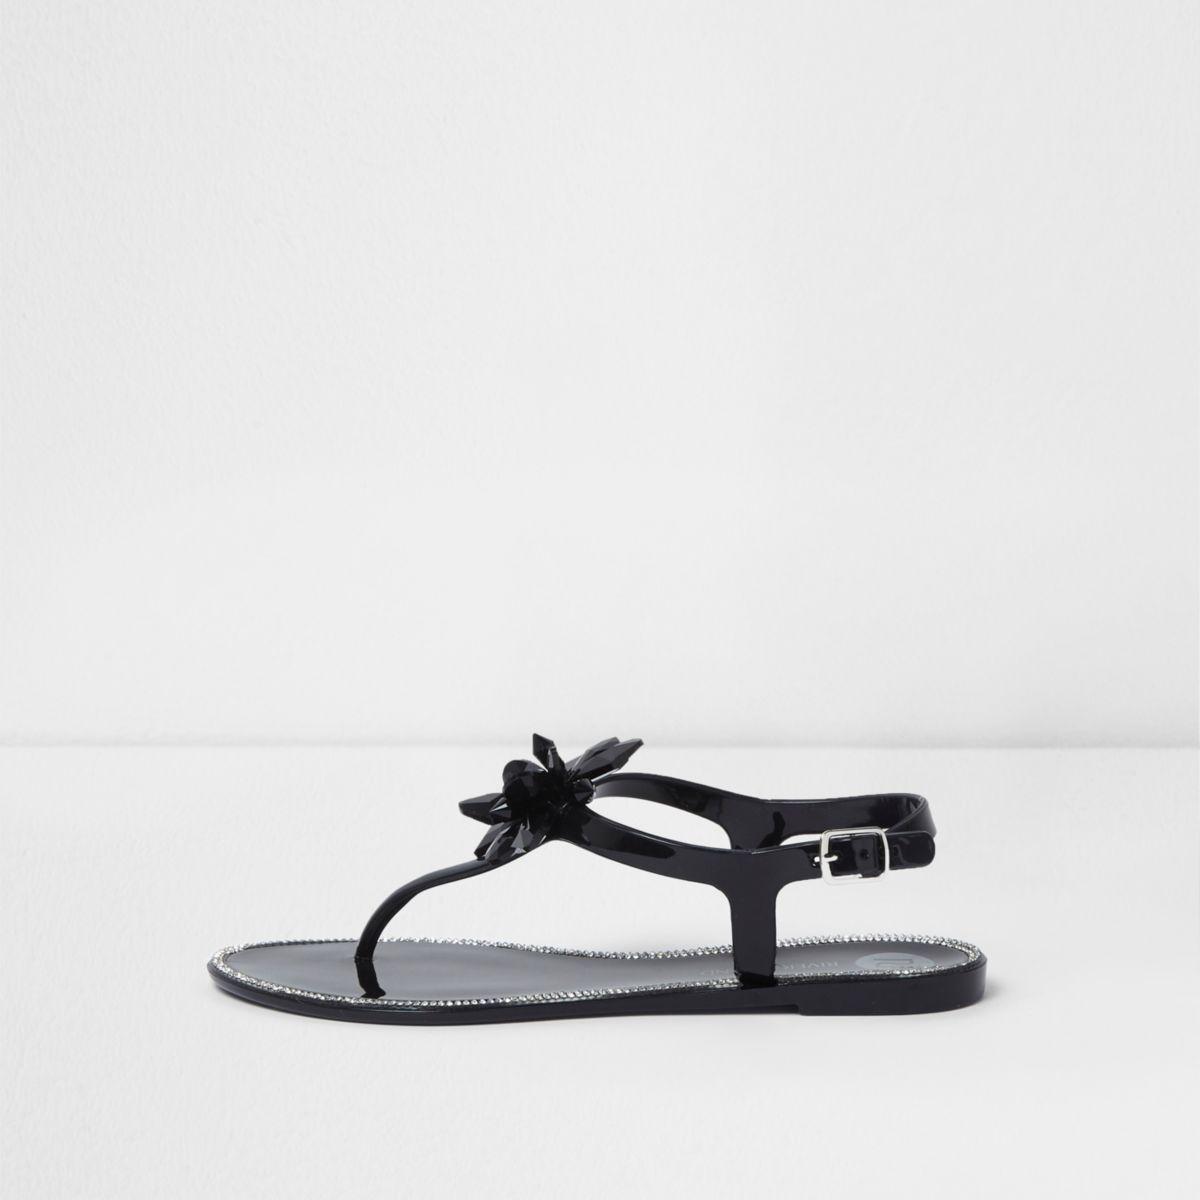 Black jelly jewel flower sandals